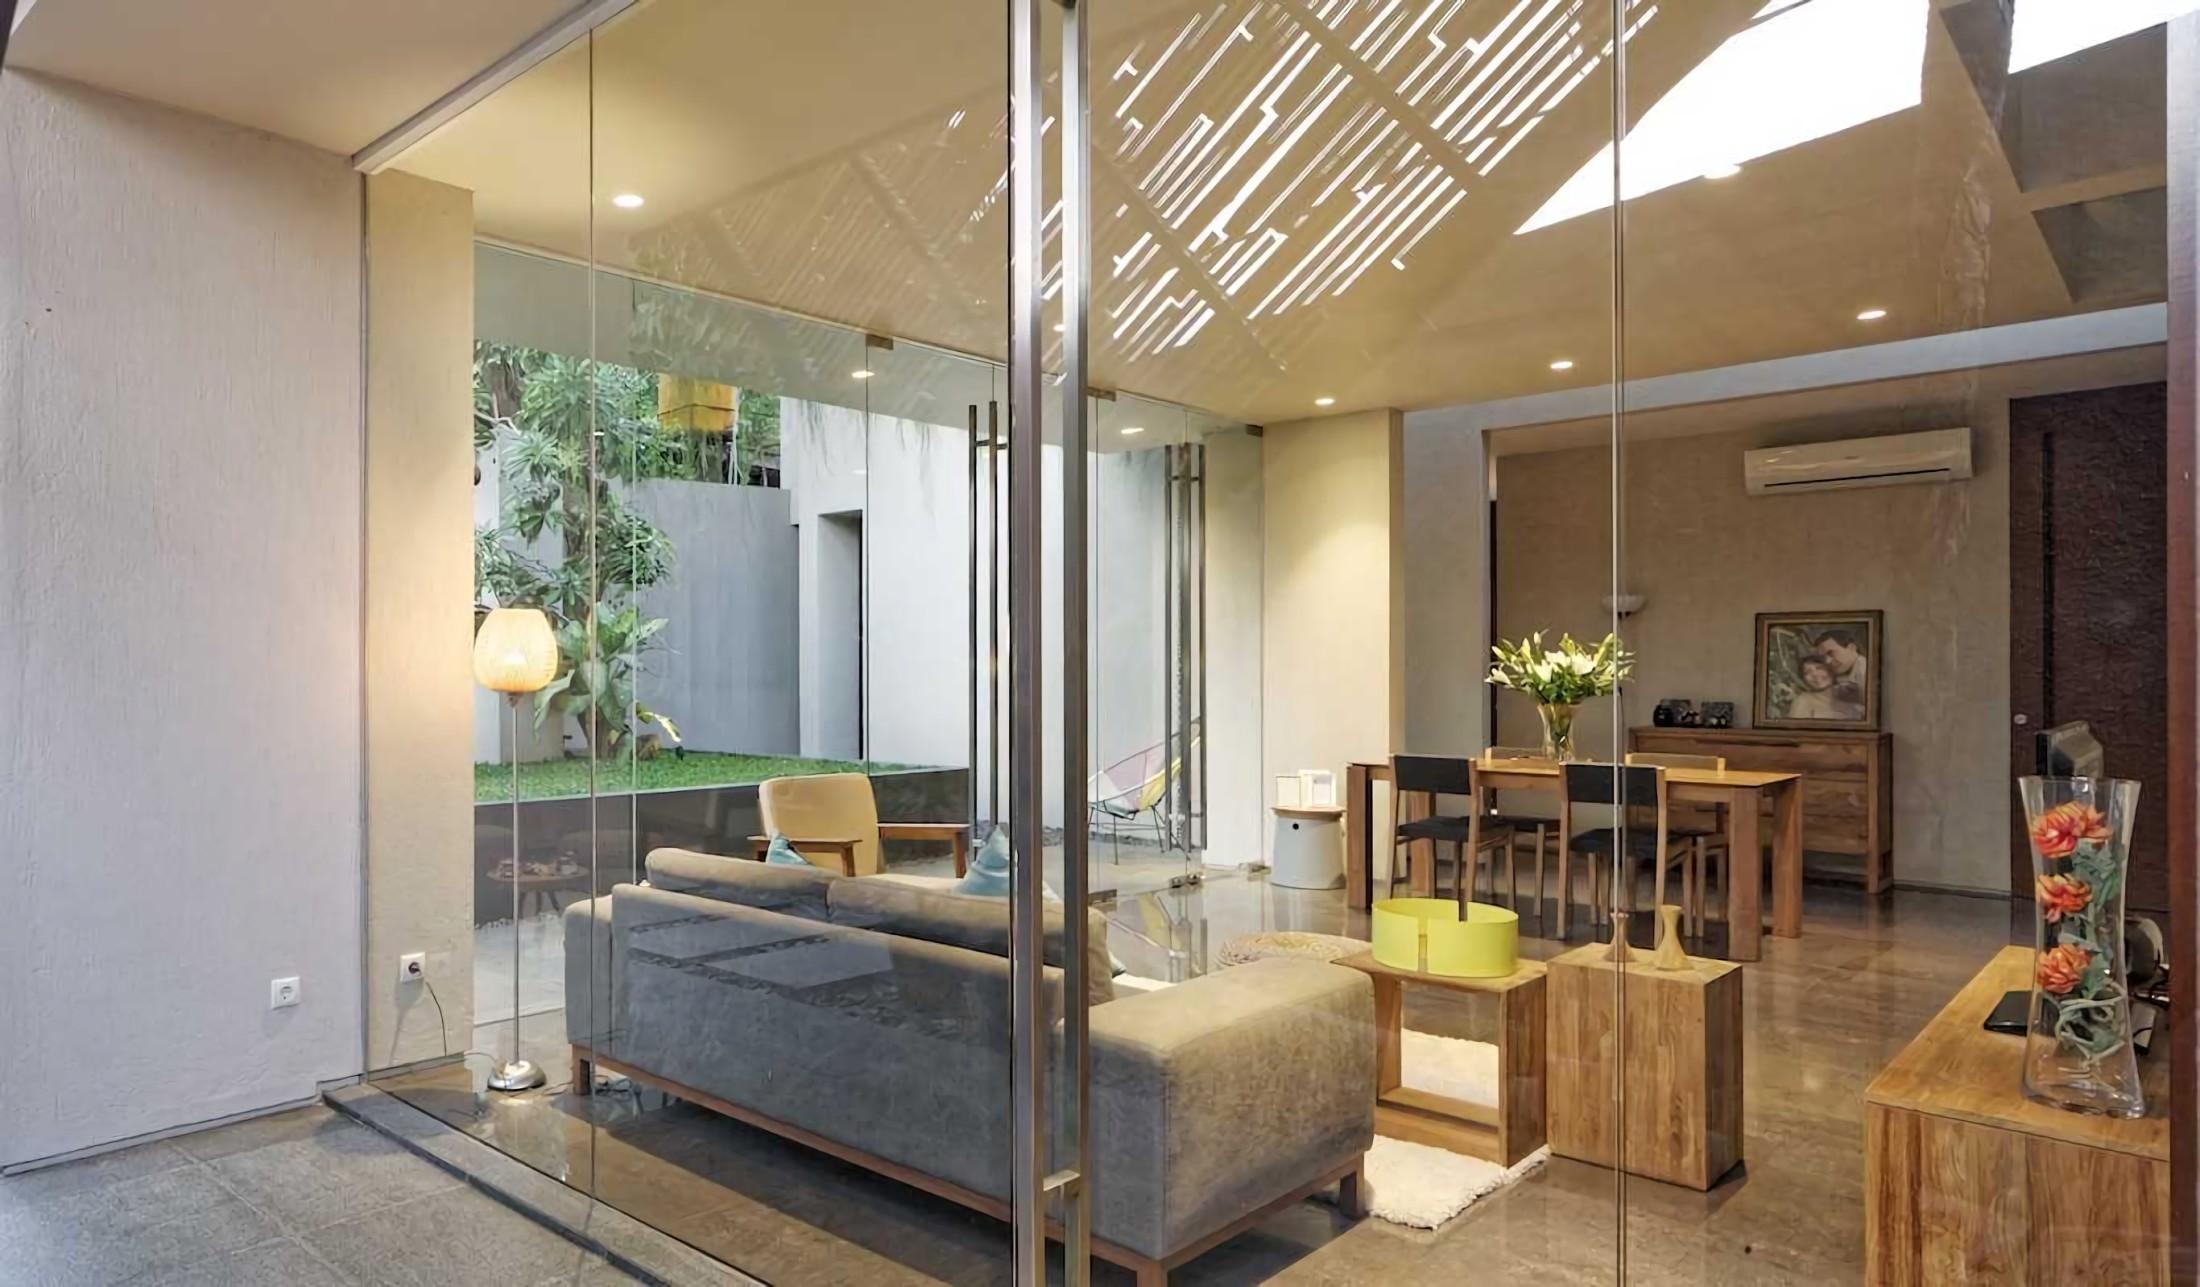 Deeroemah Arsitektur Rumah Tropis Modern yang Mungil nan Cantik